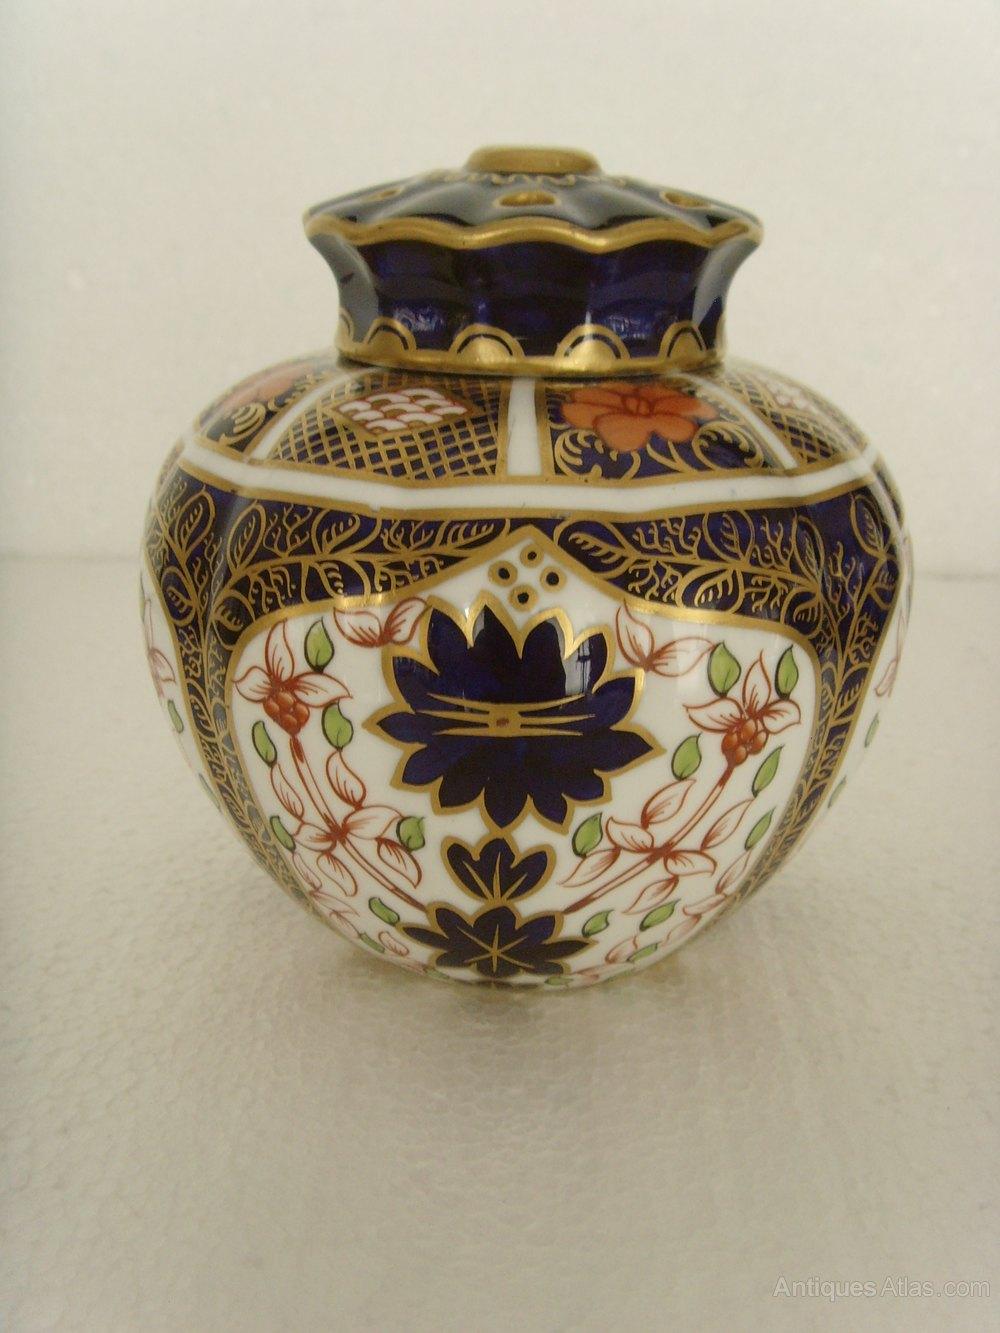 Antiques atlas royal crown derby old imari pot pourri vase 1905 royal crown derby old imari pot pourri vase 1905 reviewsmspy